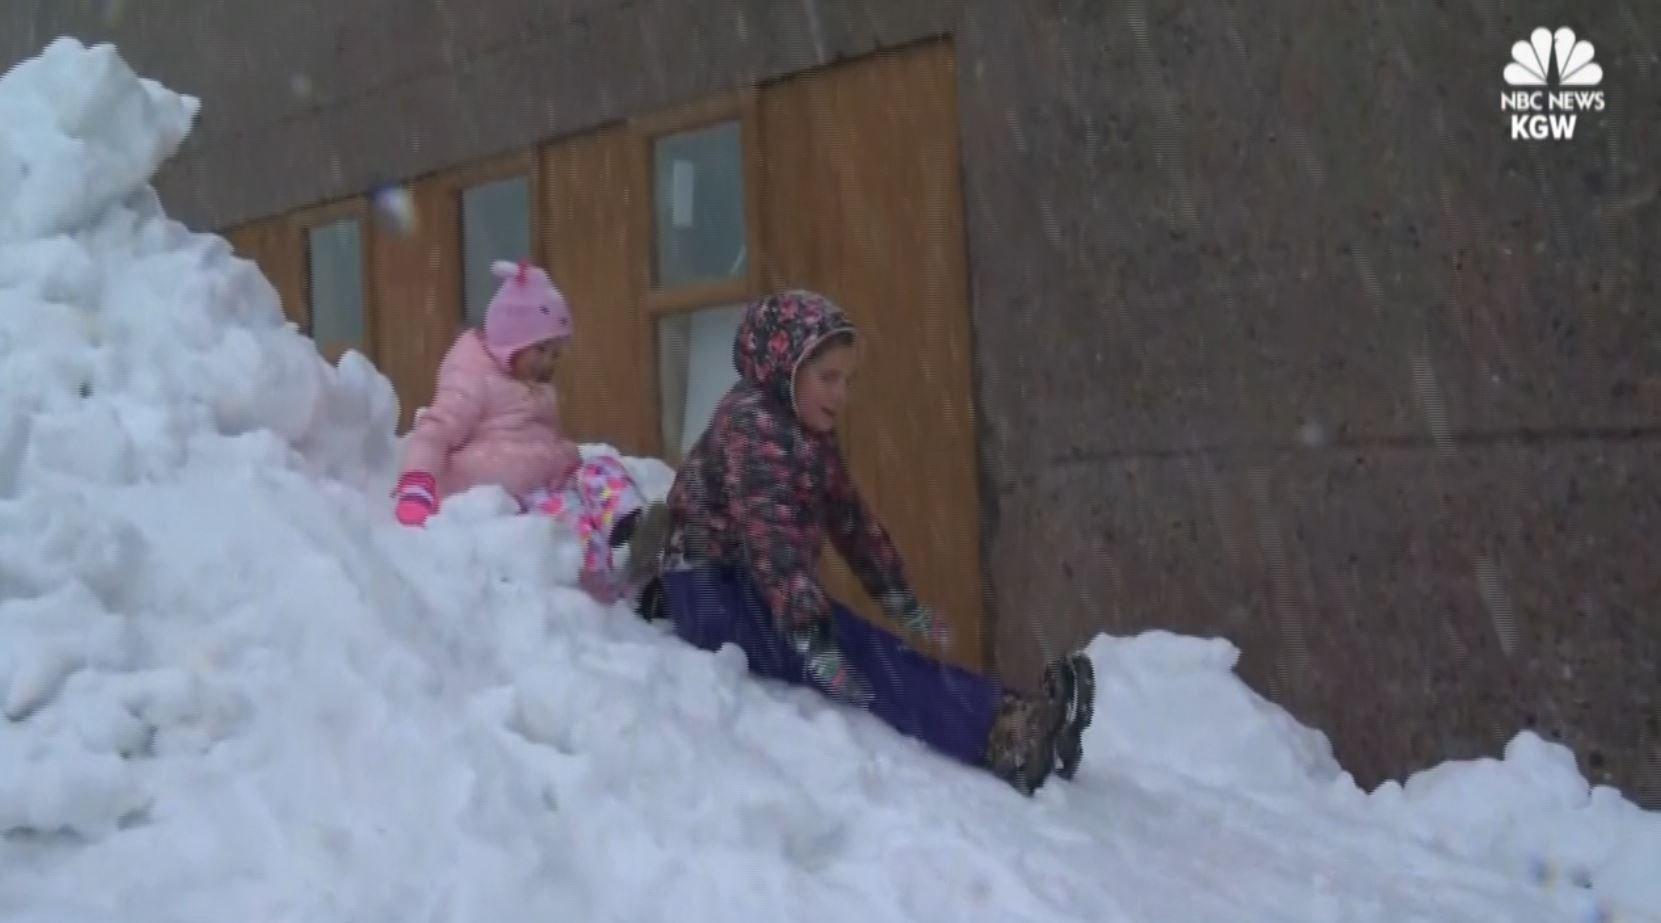 Kids play in the snow near Mount Hood in Oregon.